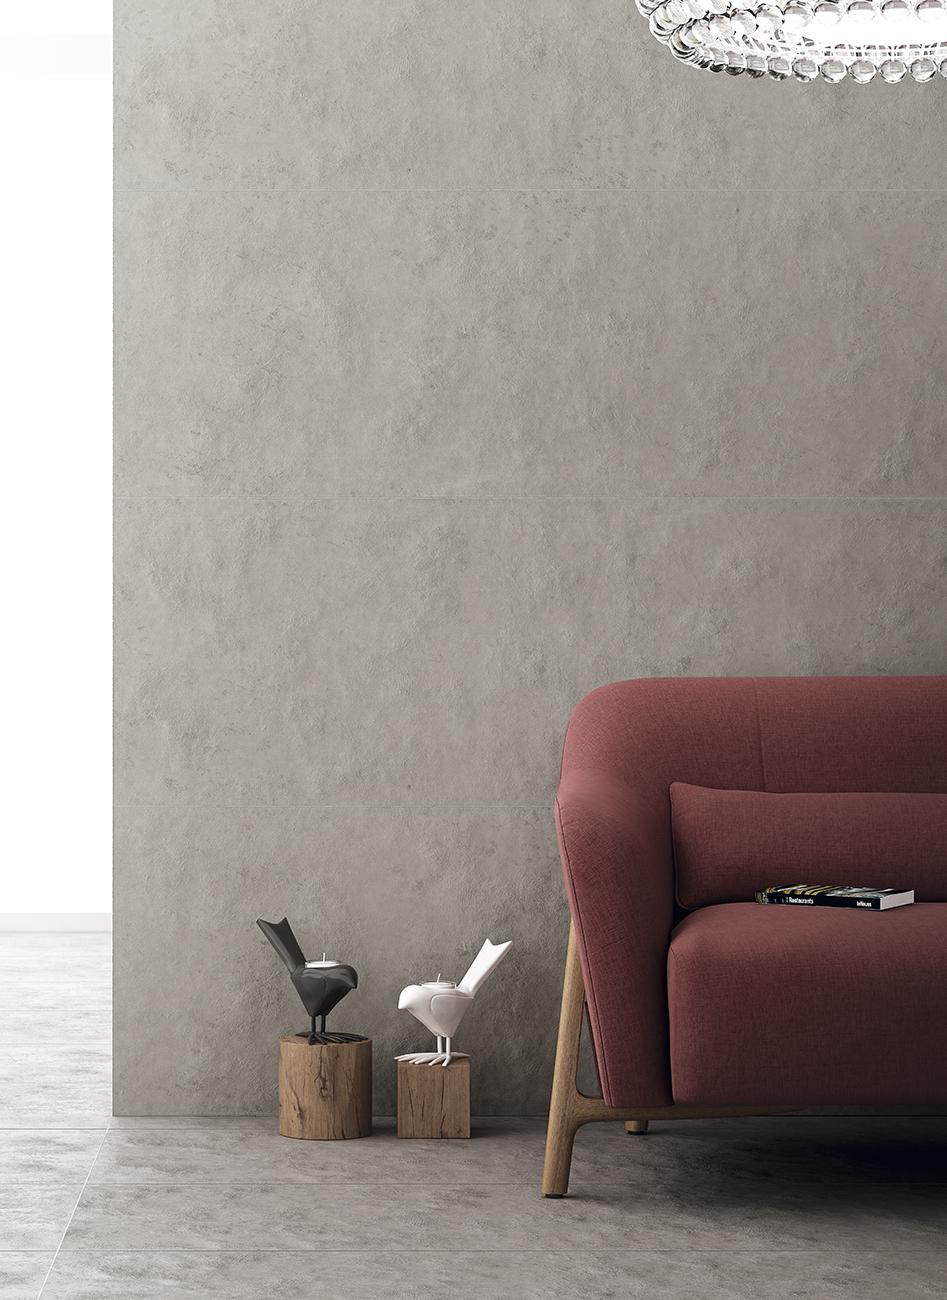 amb-living-ceramics-strato-grey-01-gallery.jpg